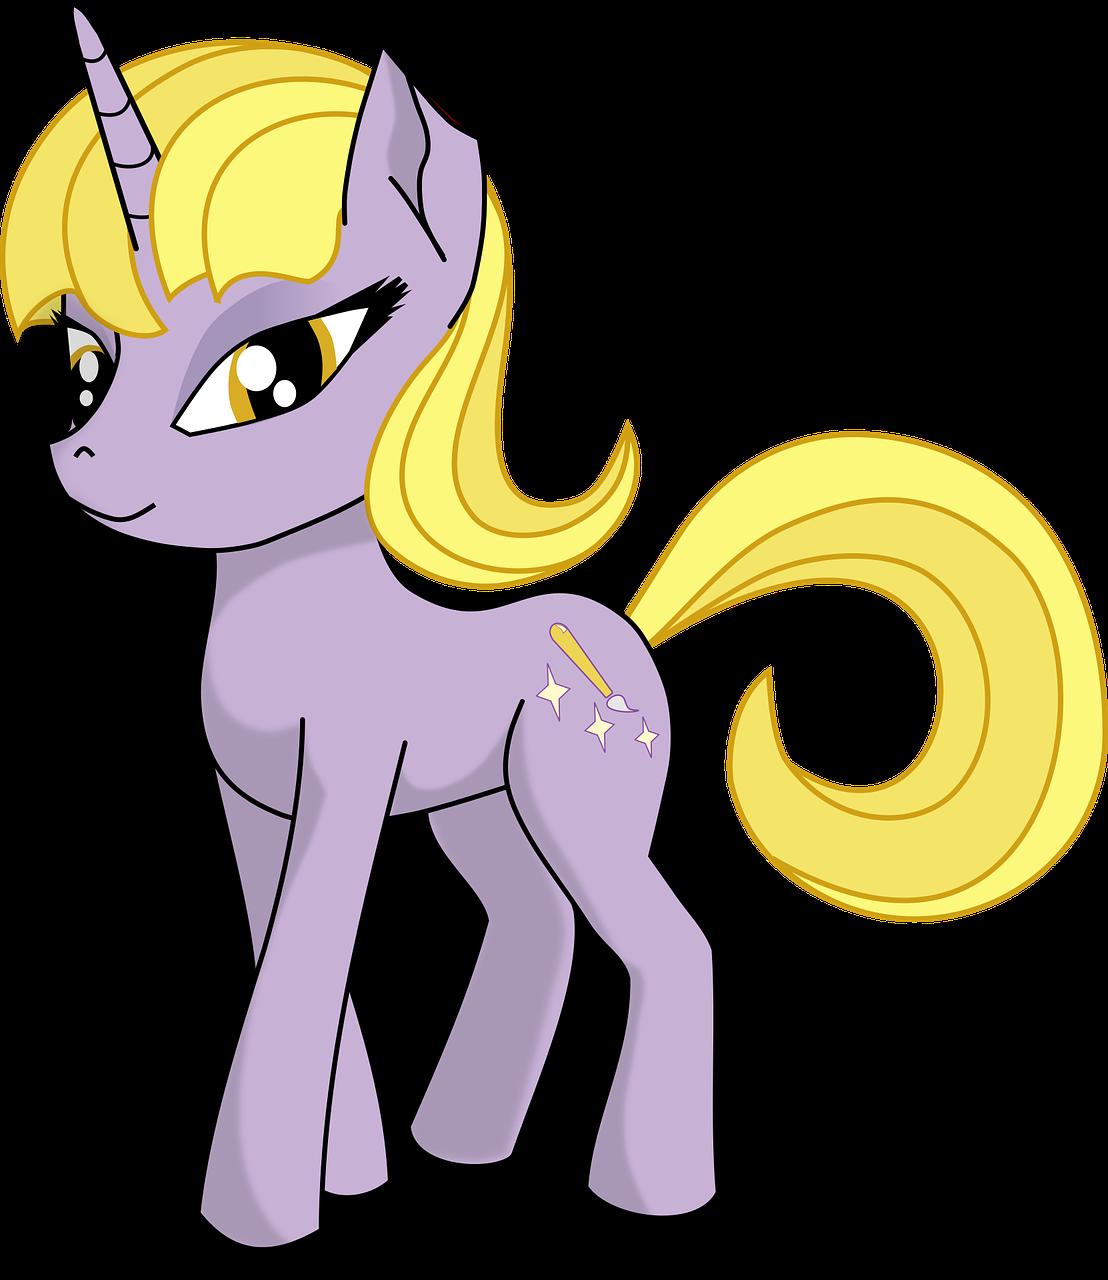 Unicorn Fantasy Fairy Tale Free Vector Graphic On Pixabay